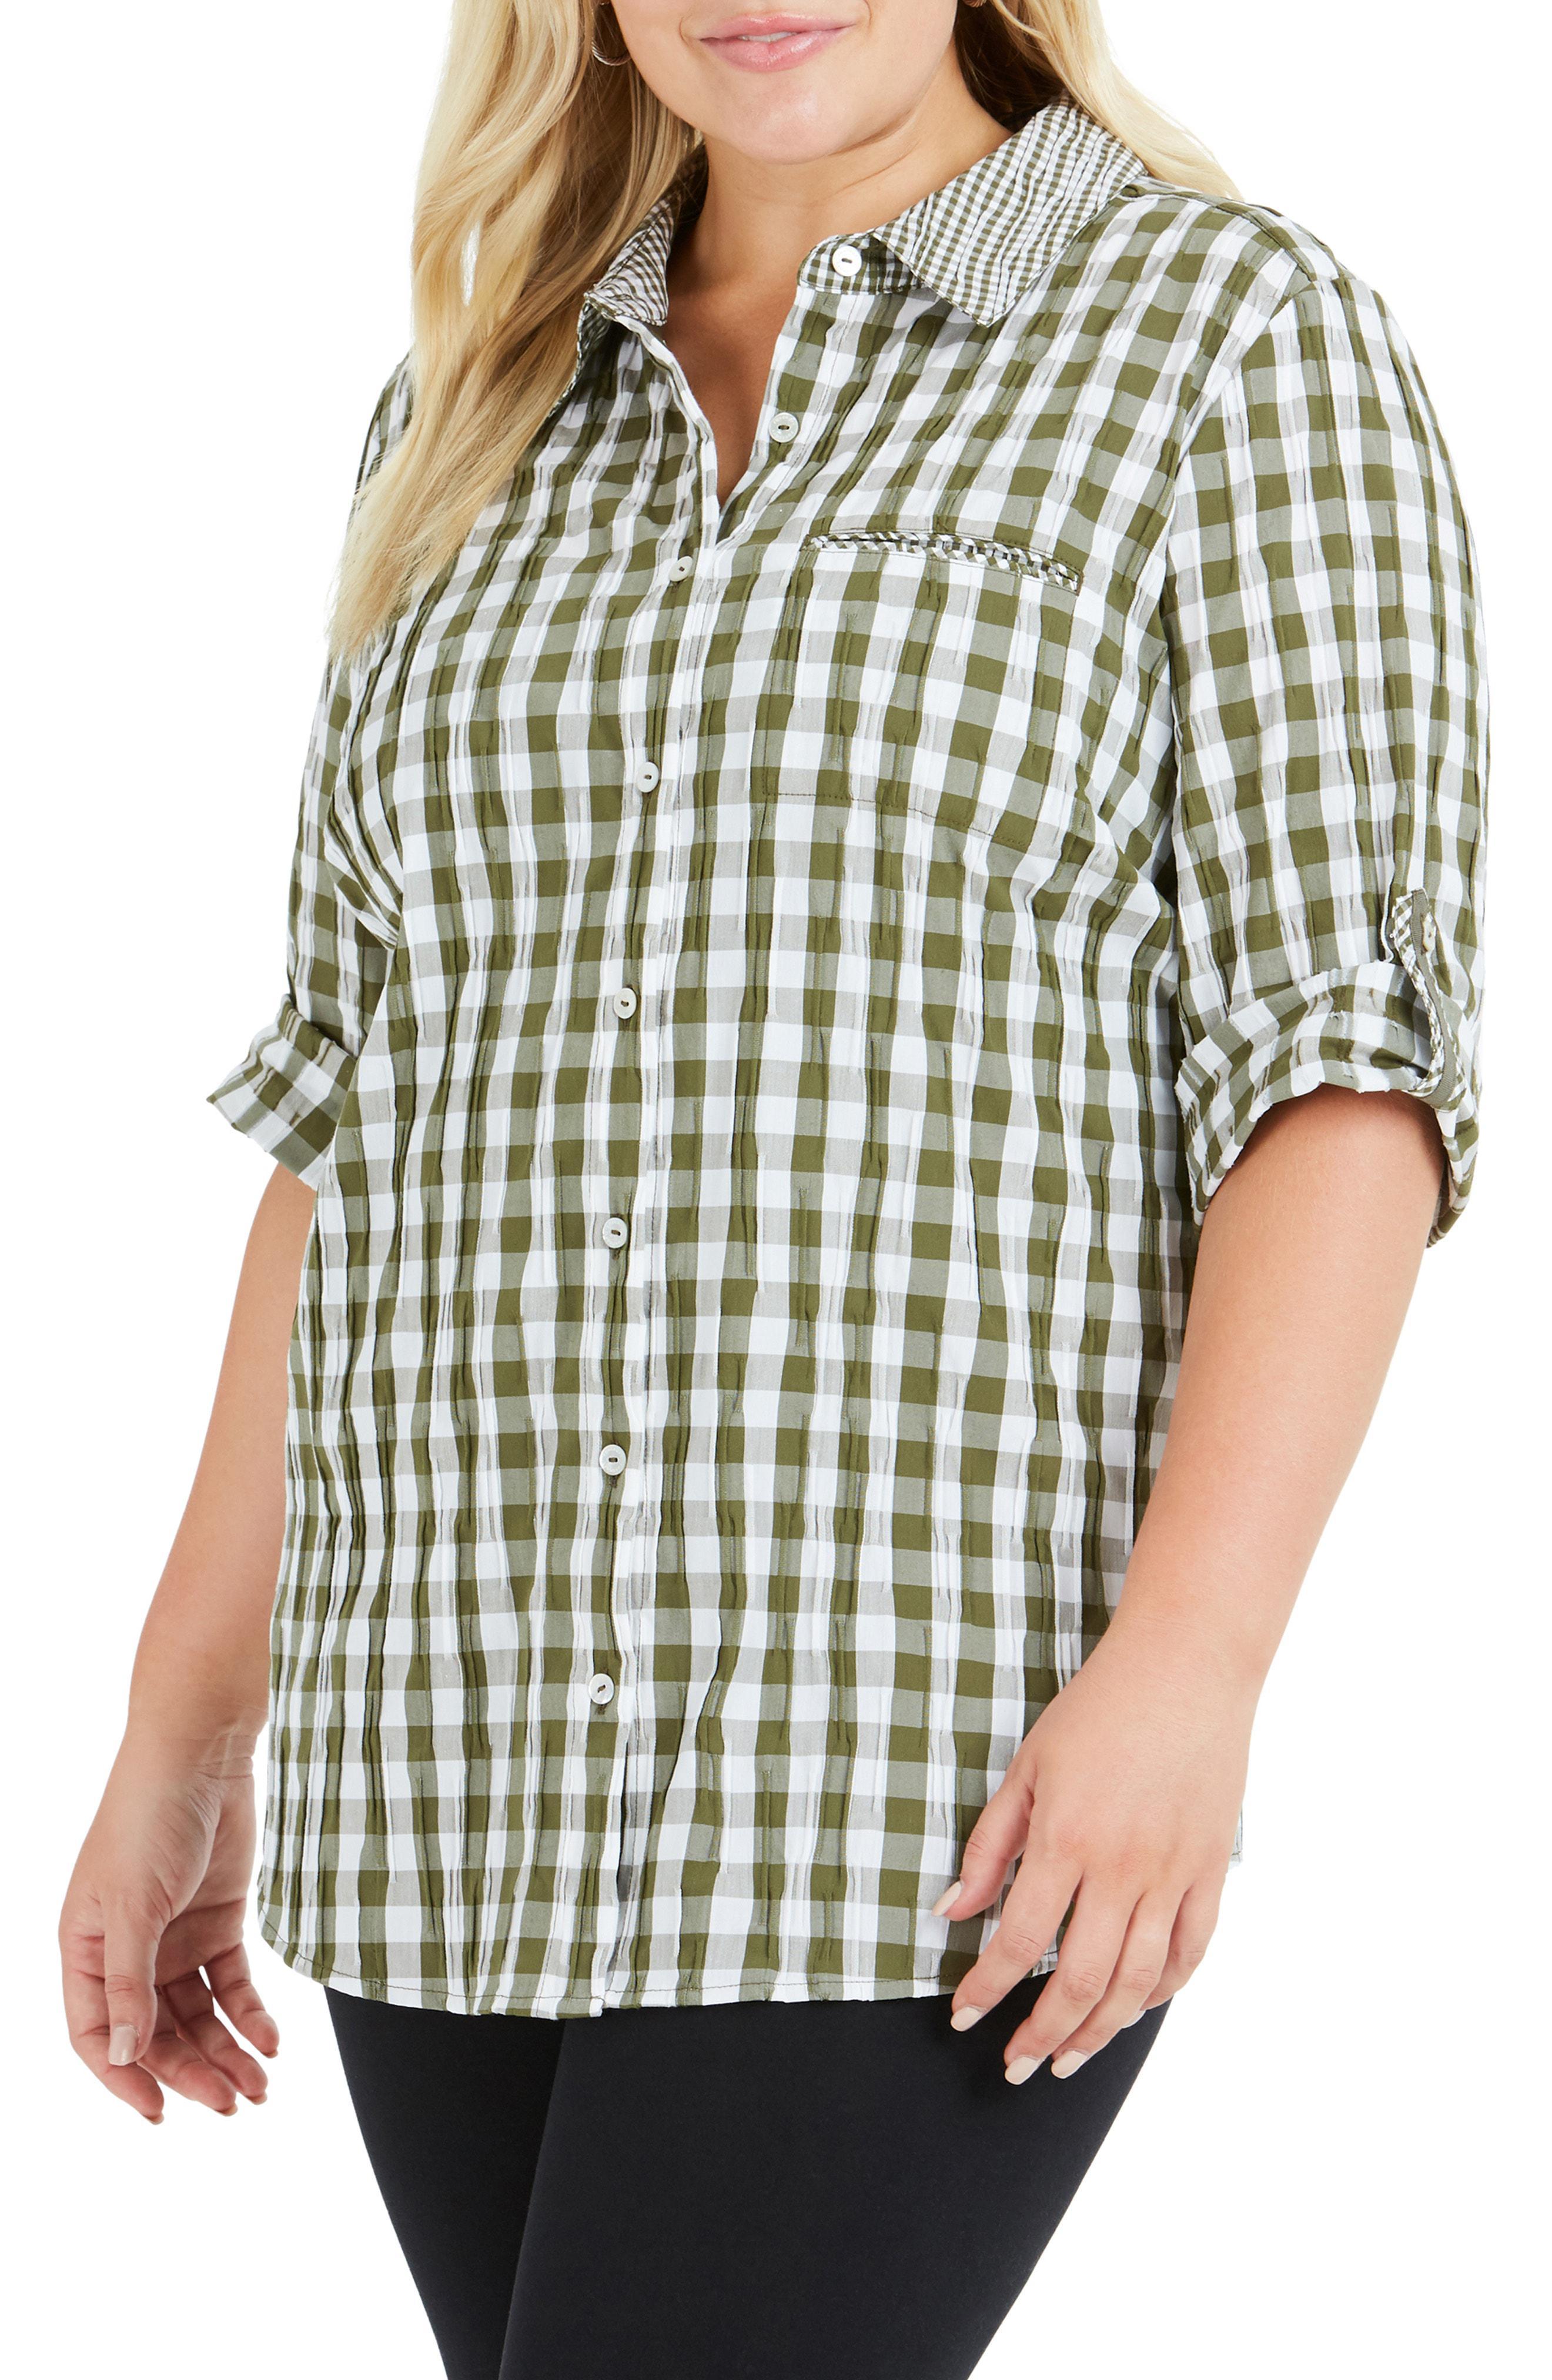 3d0b1f9b098 Foxcroft. Women s Reese Gingham Shirt